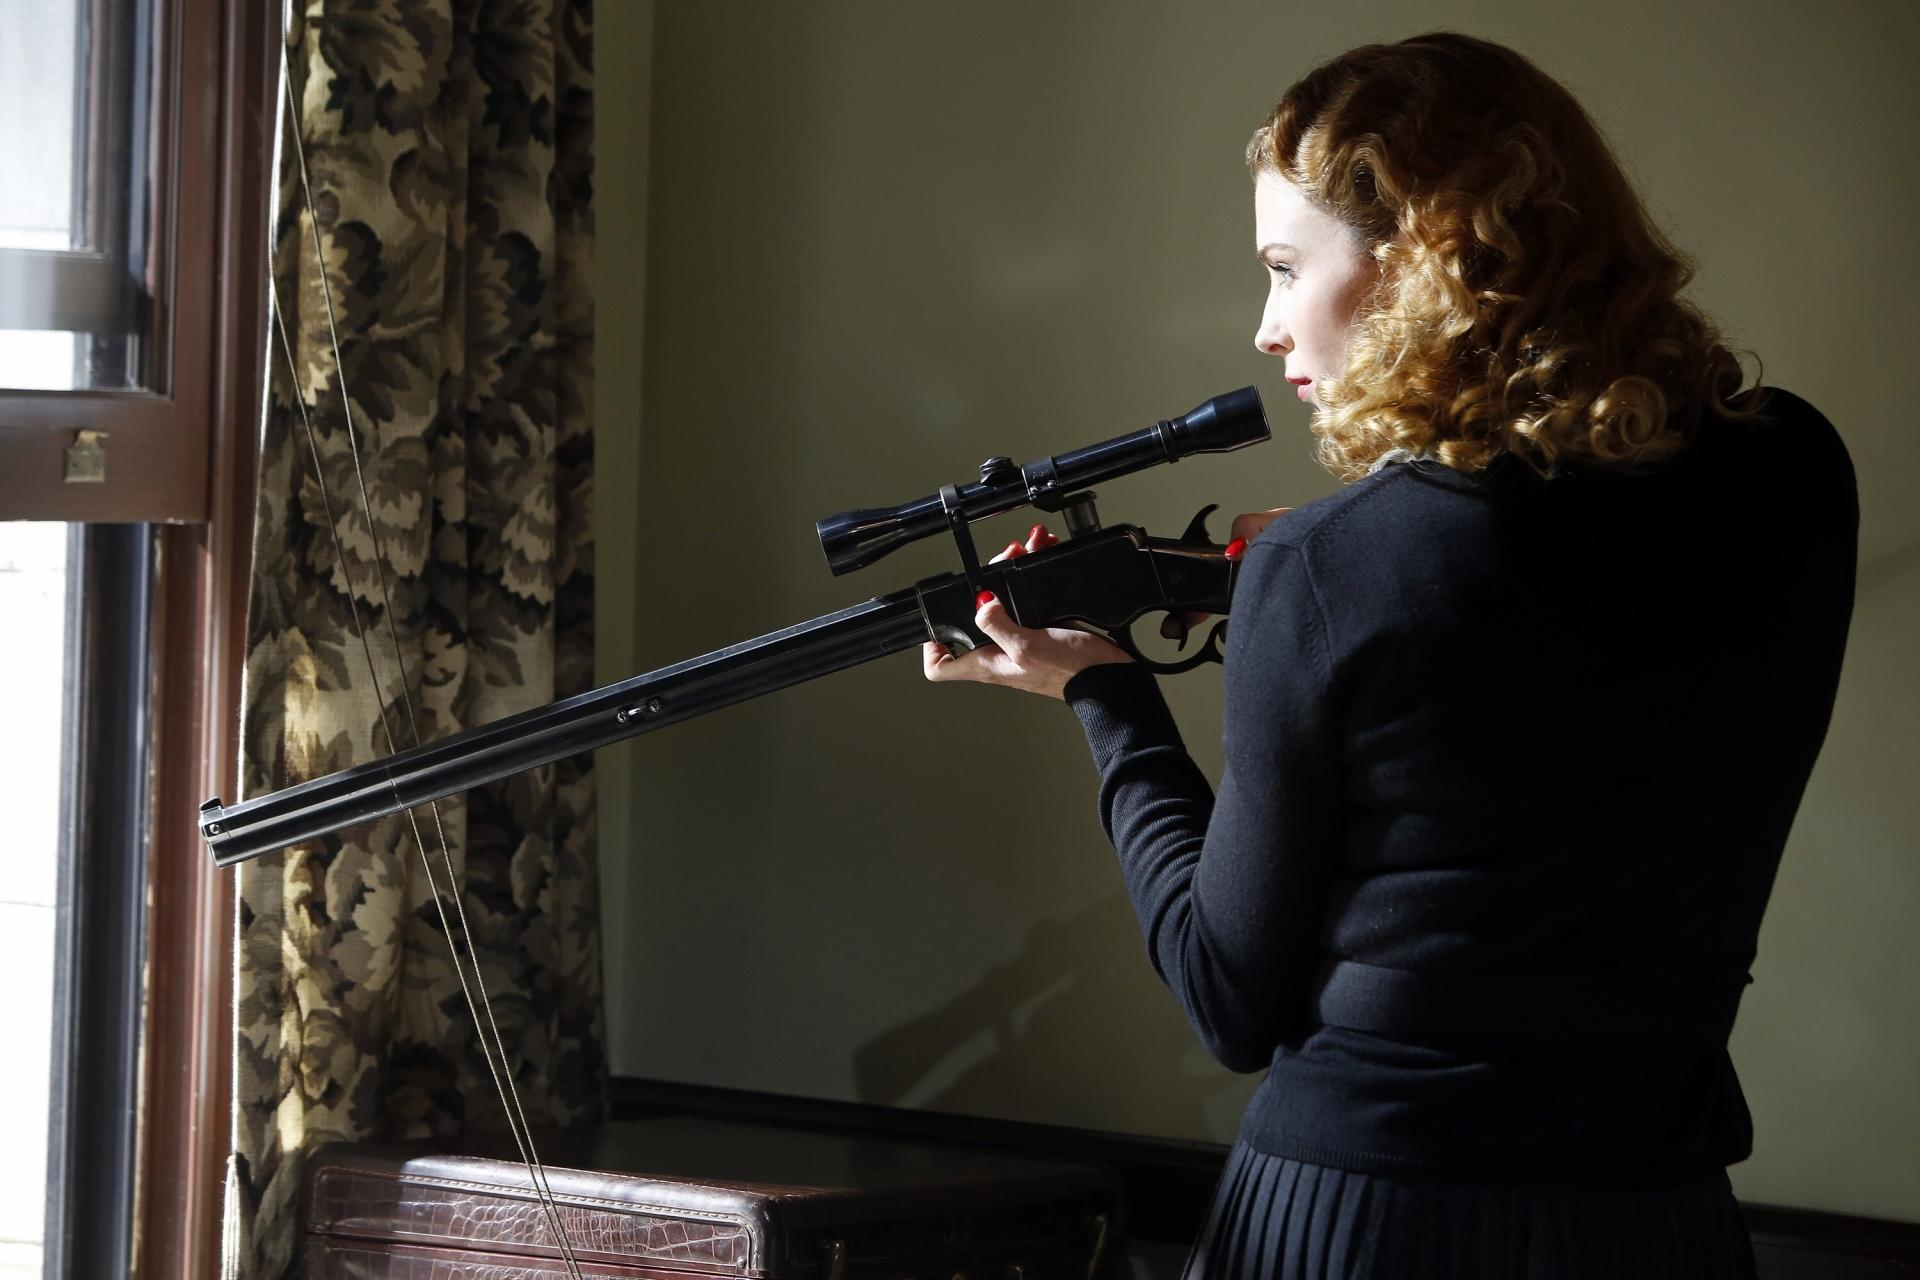 Funny Girl Wallpaper Images Agent Carter Wallpaper Hd Download